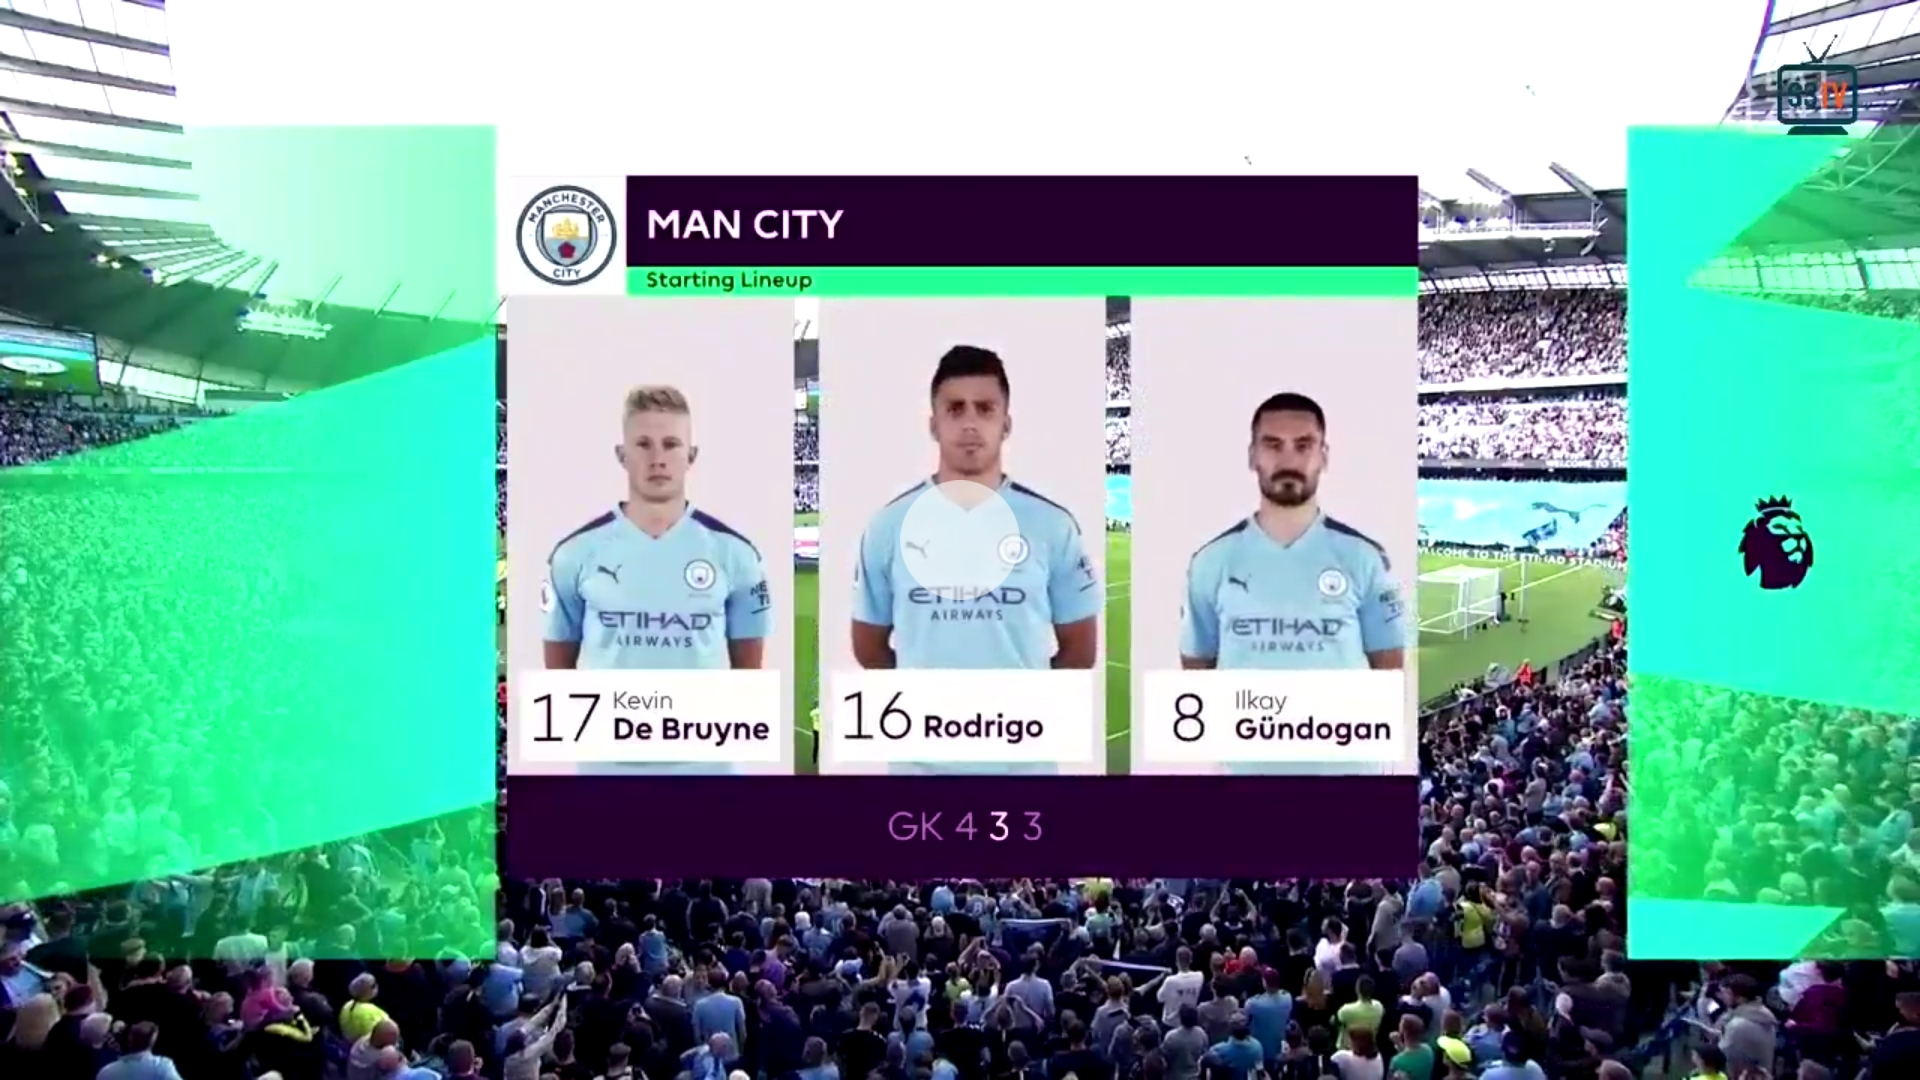 17-08-2019 - Manchester City 2-2 Tottenham Hotspur